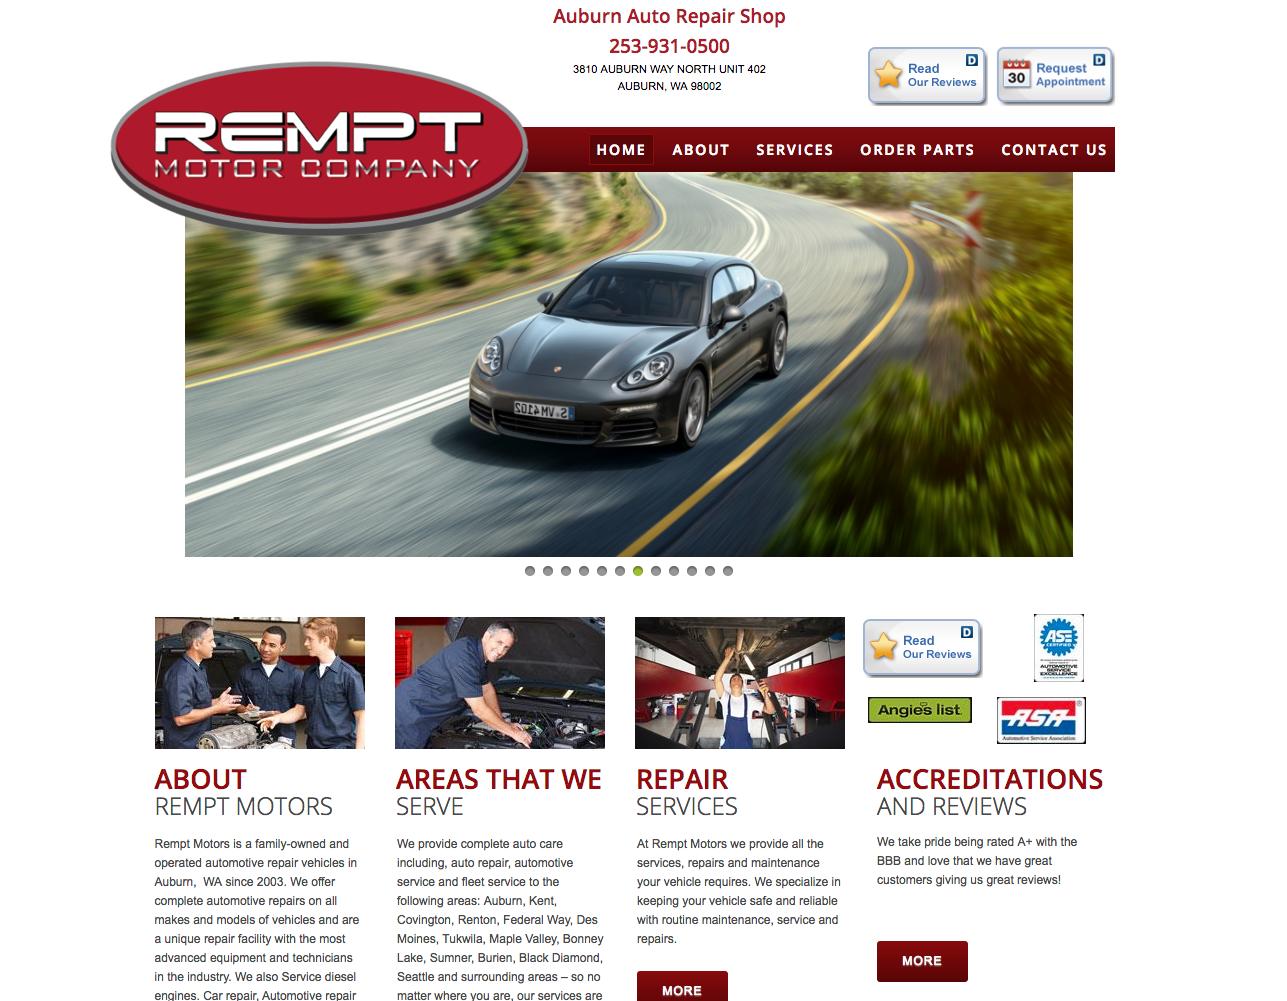 REMPT AUTO REPAIR - (Not an active site)